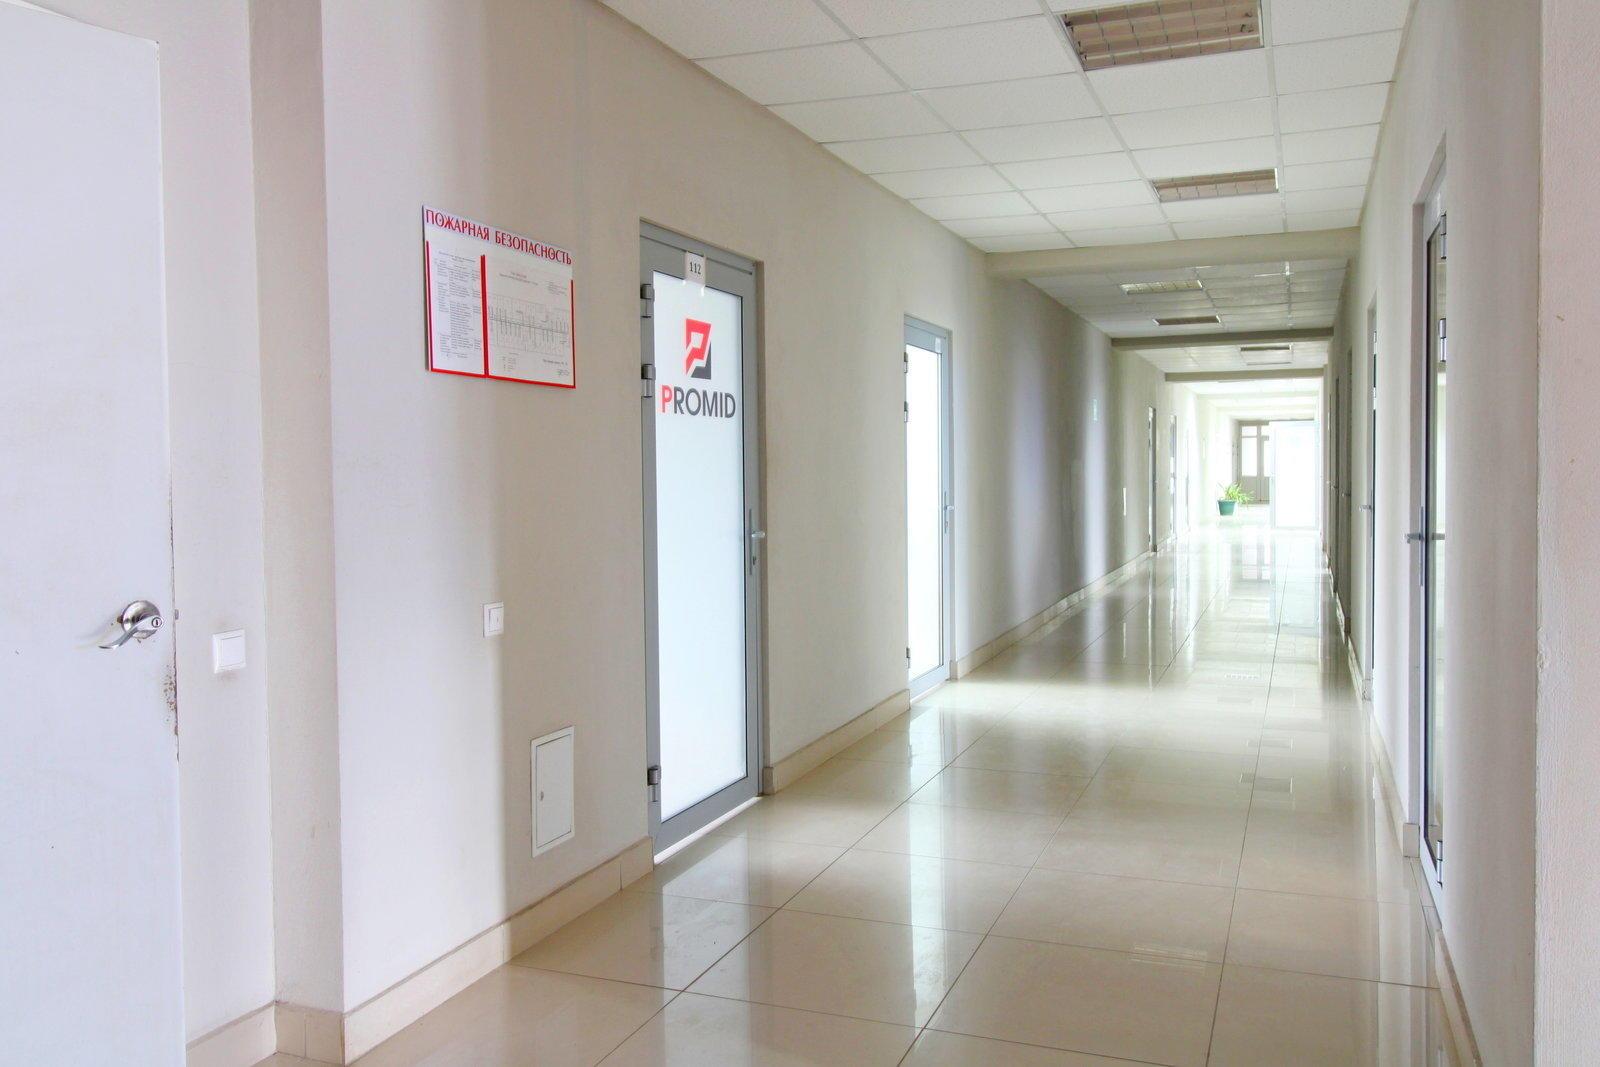 Продажа офиса на ул. Передовая, д. 6 в Минске - фото 4